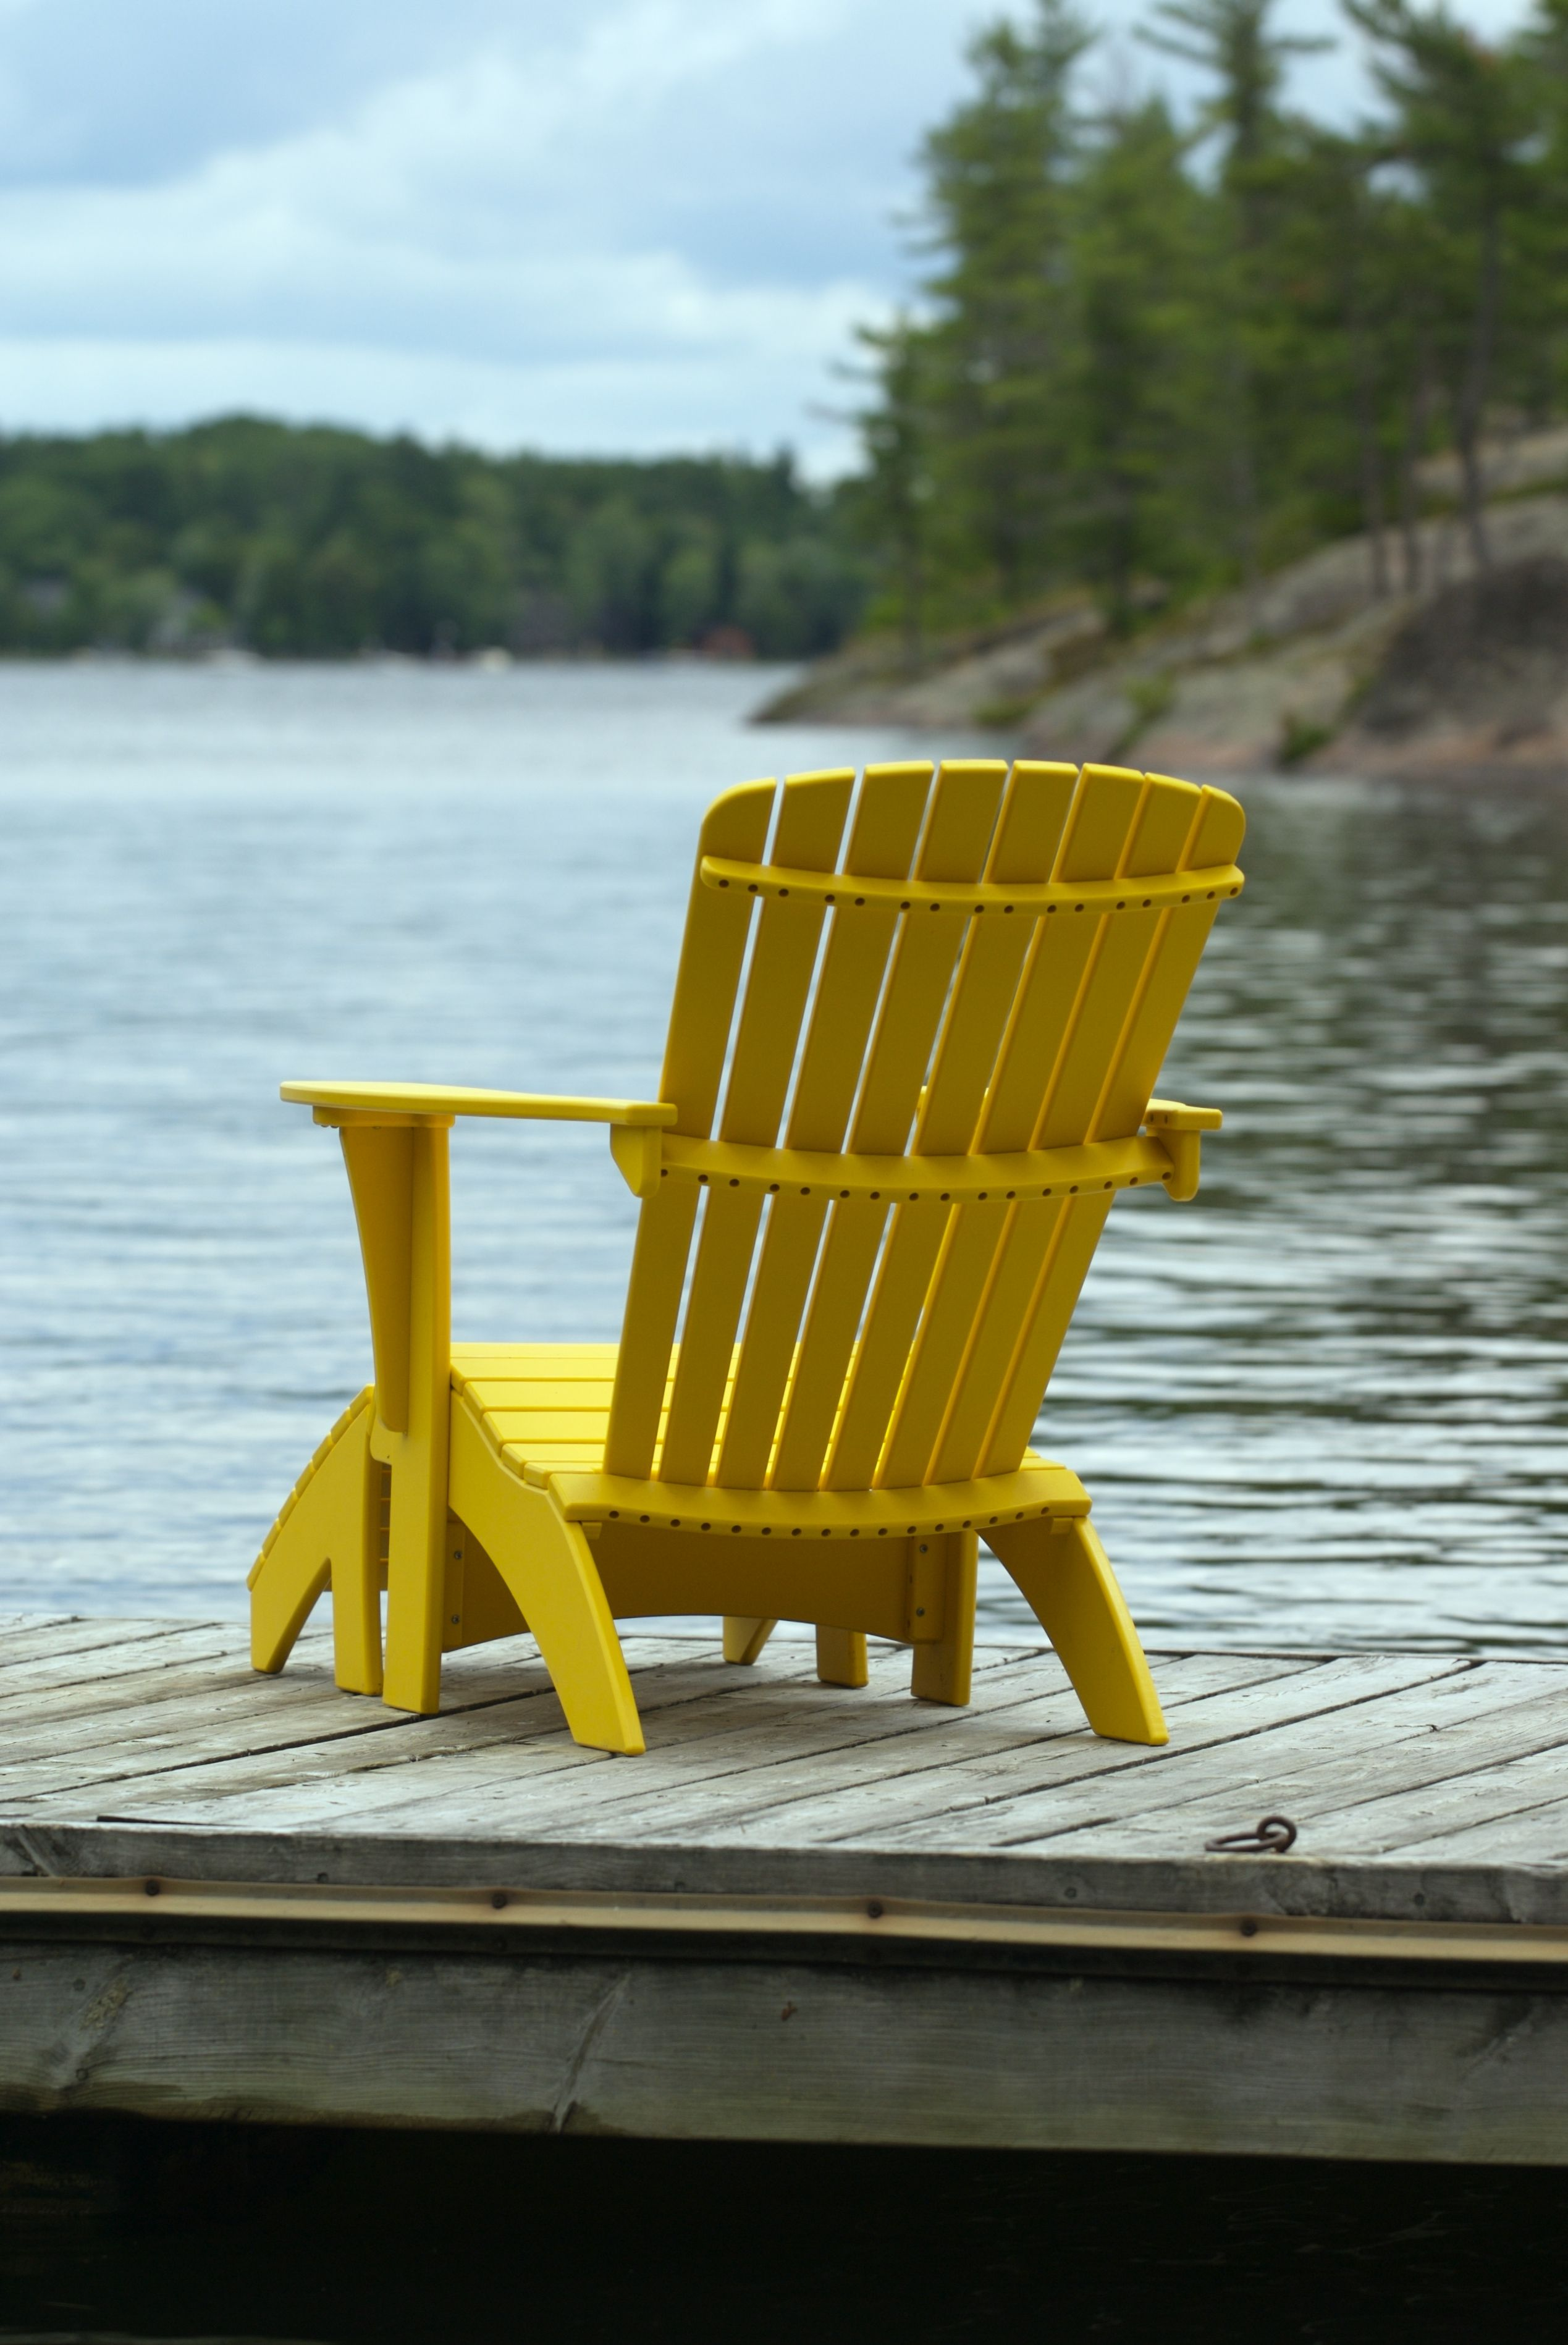 Morning Sun Muskoka Chair  Extension  At the Lake